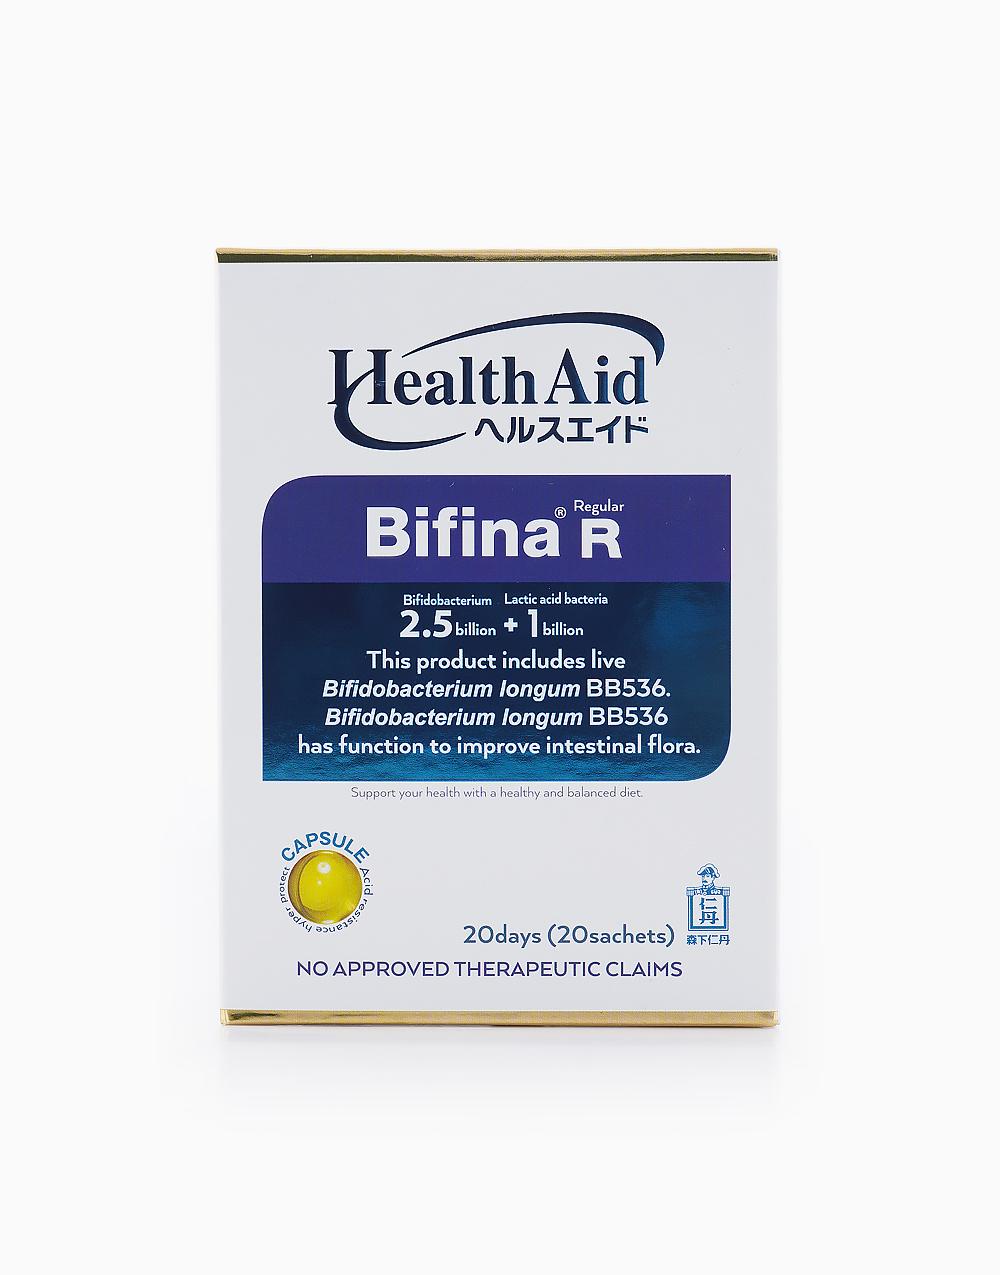 HealthAid Bifina R for 20 Days (20 Packets) by Health Aid Bifina by Jintan